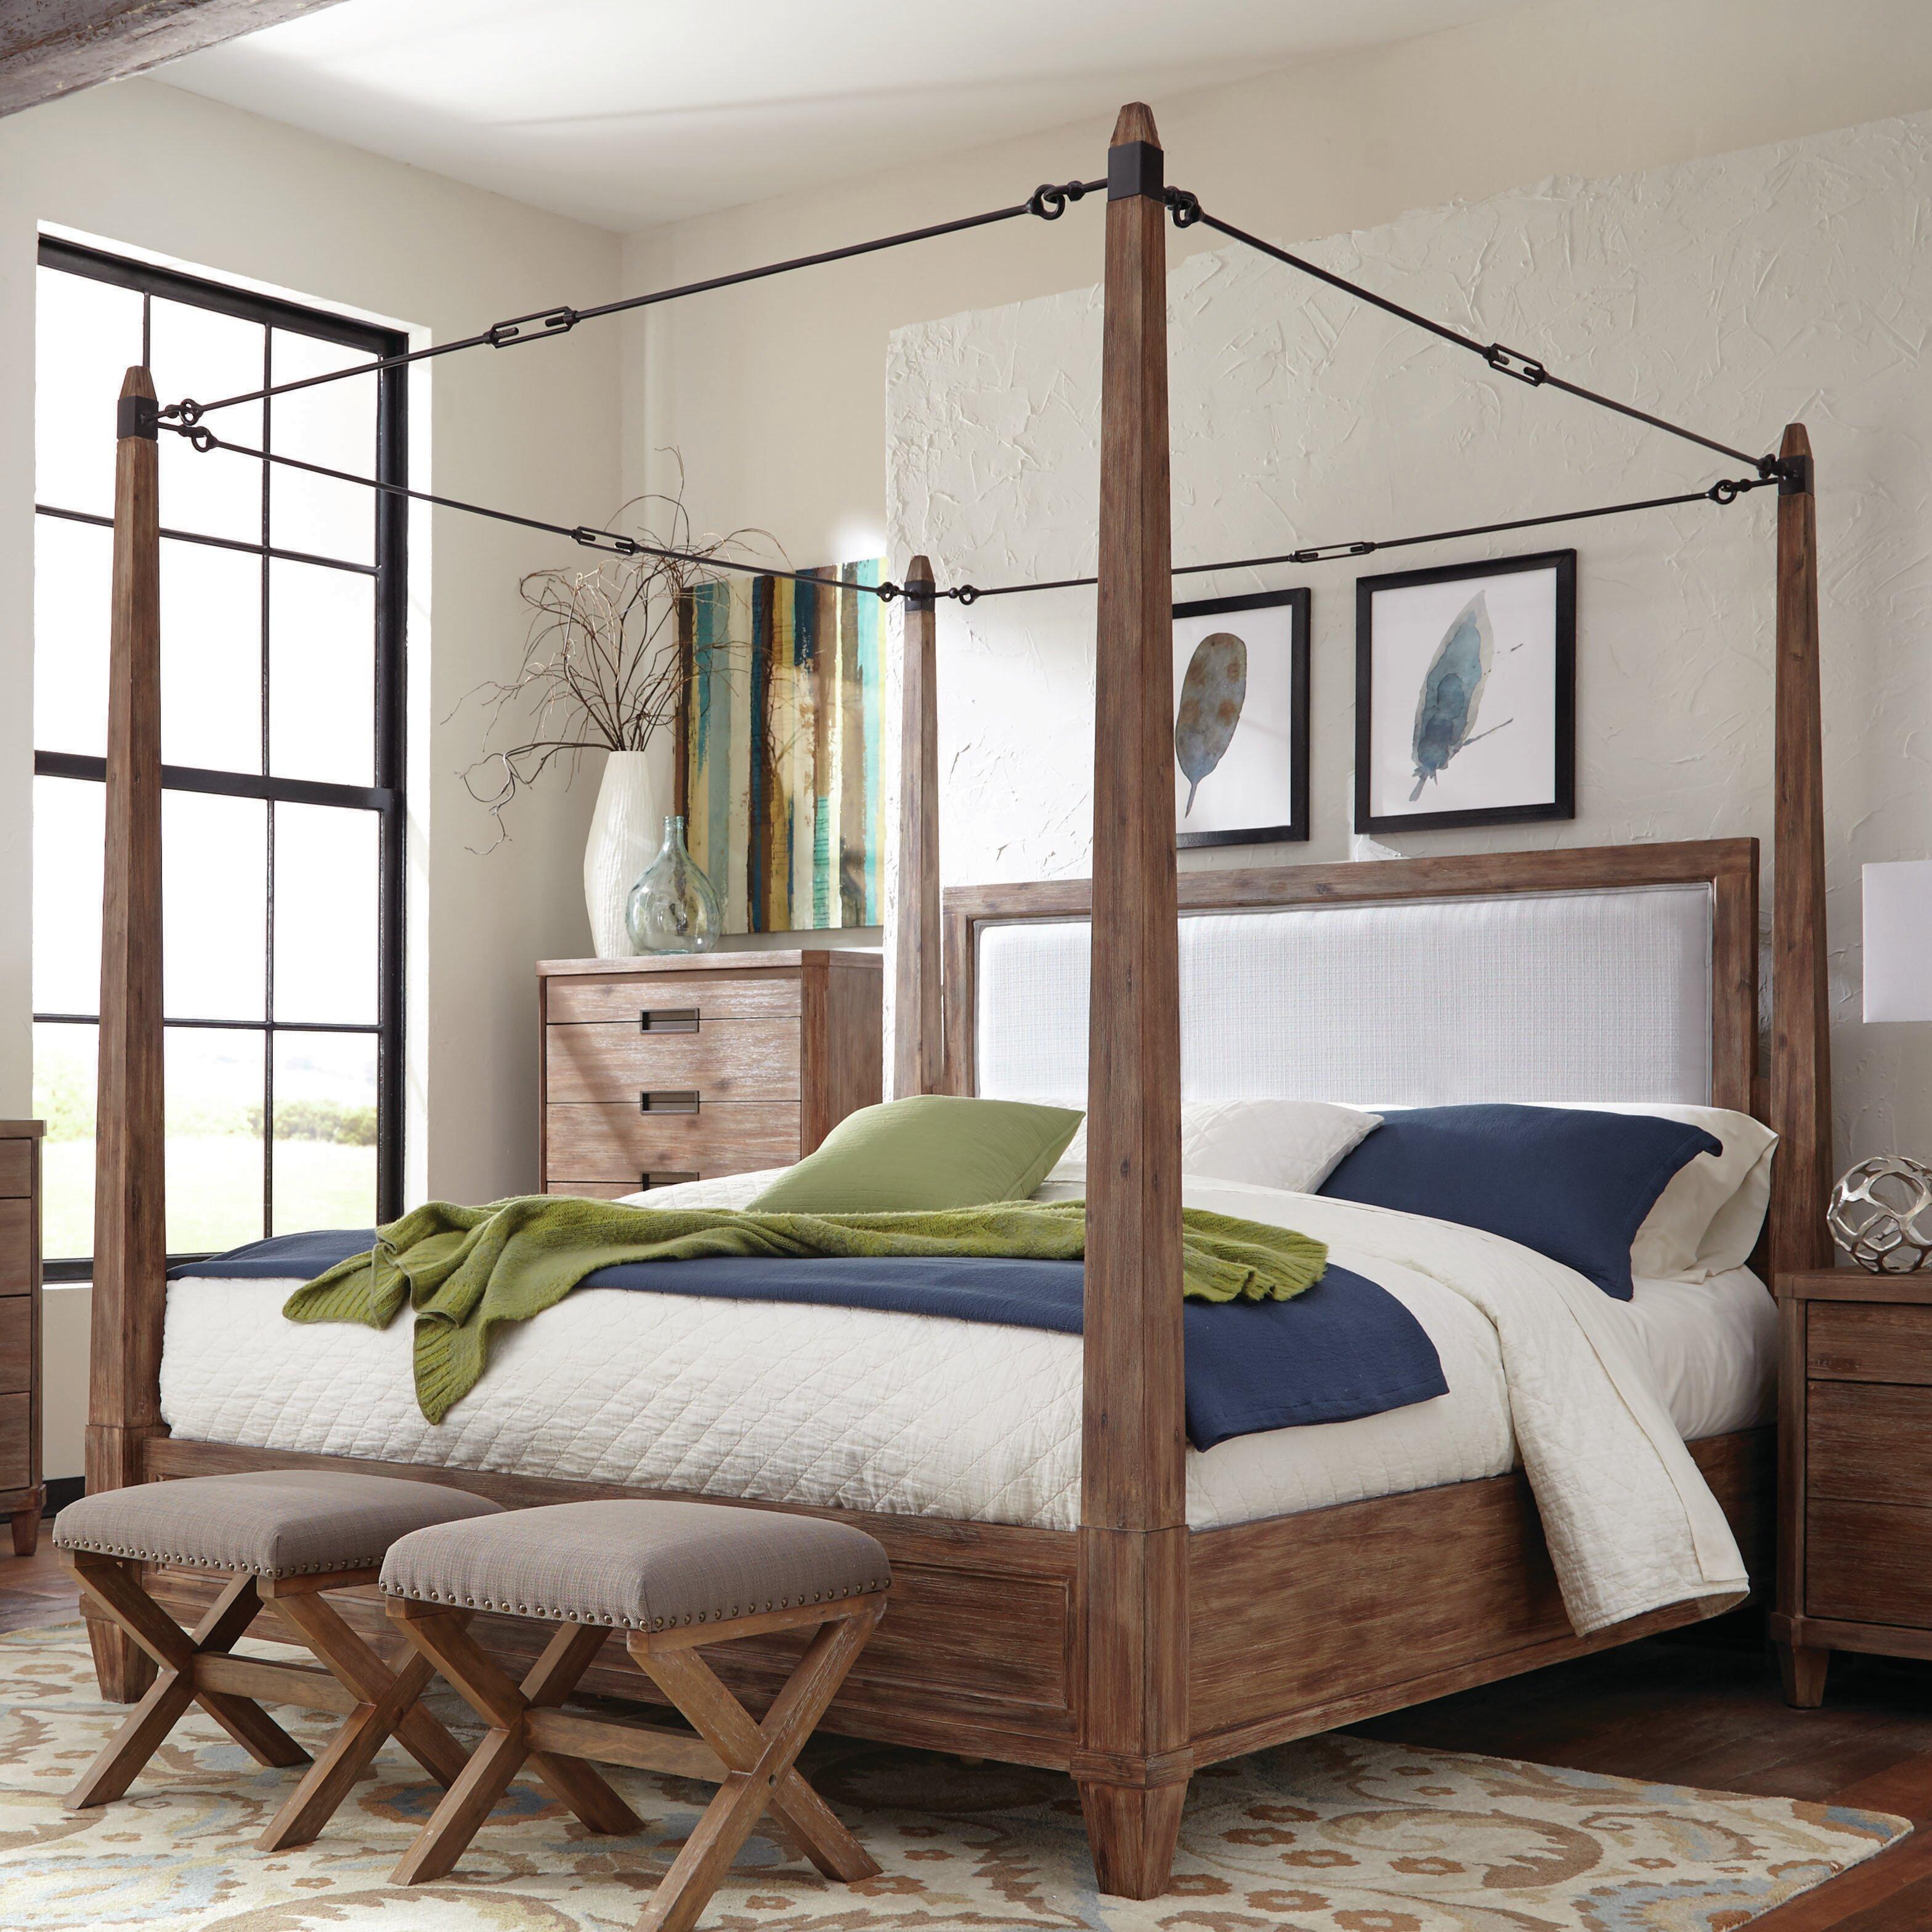 Canopy Beds You'll Love | Wayfair -